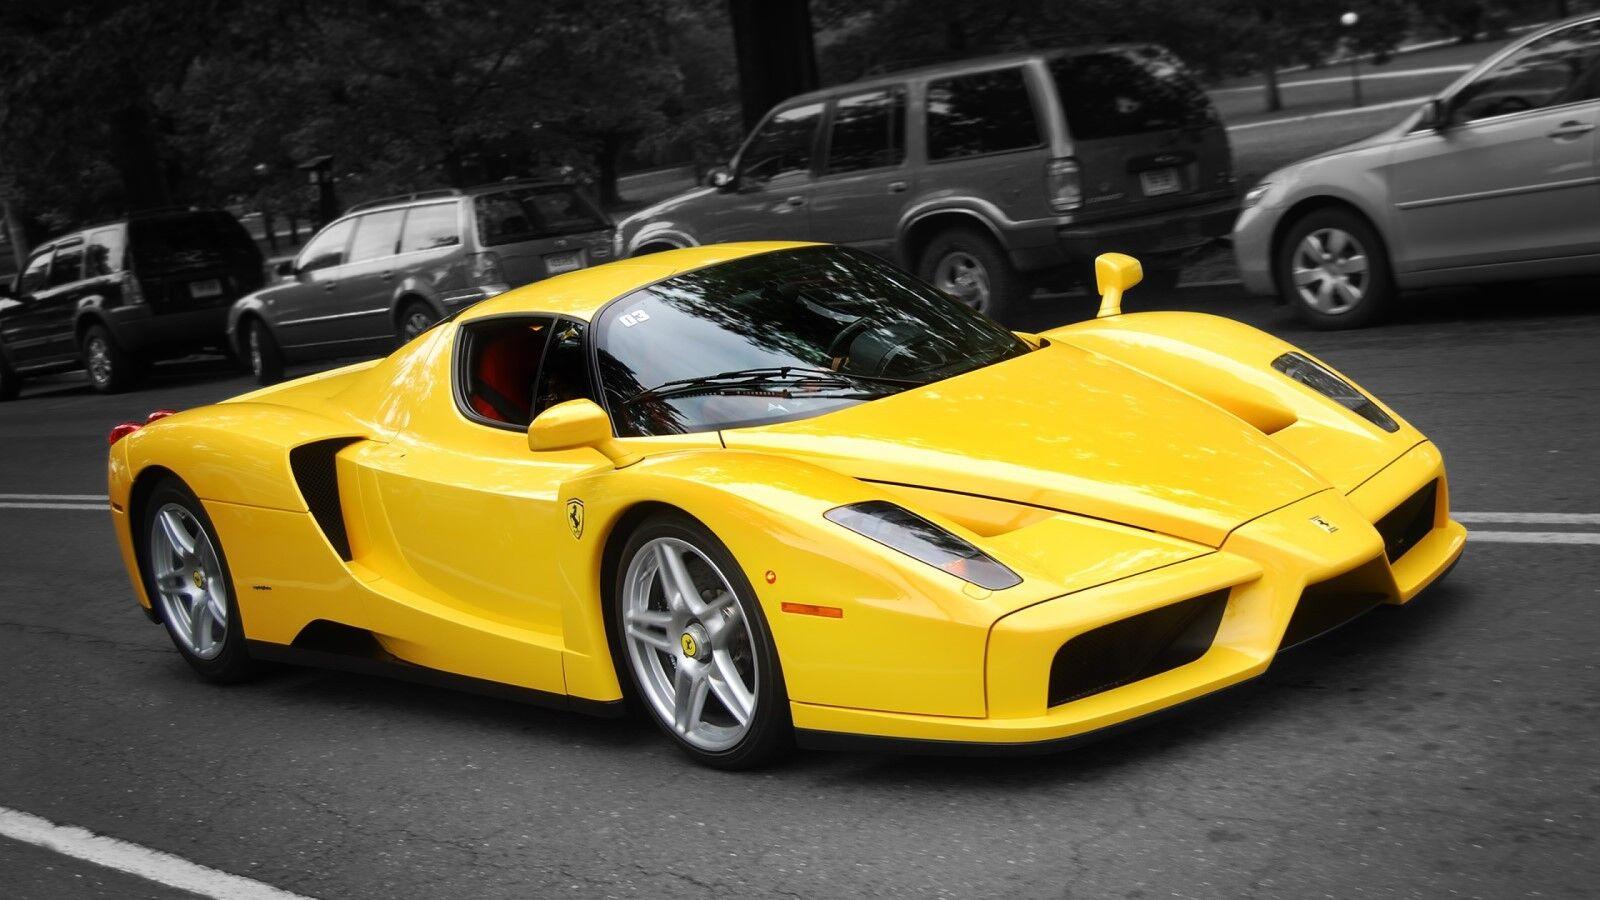 1 Ferrari F1 Racing GT SPORT RACE CAR 12 exótico 43 Racer 24 carrusel amarillo 18